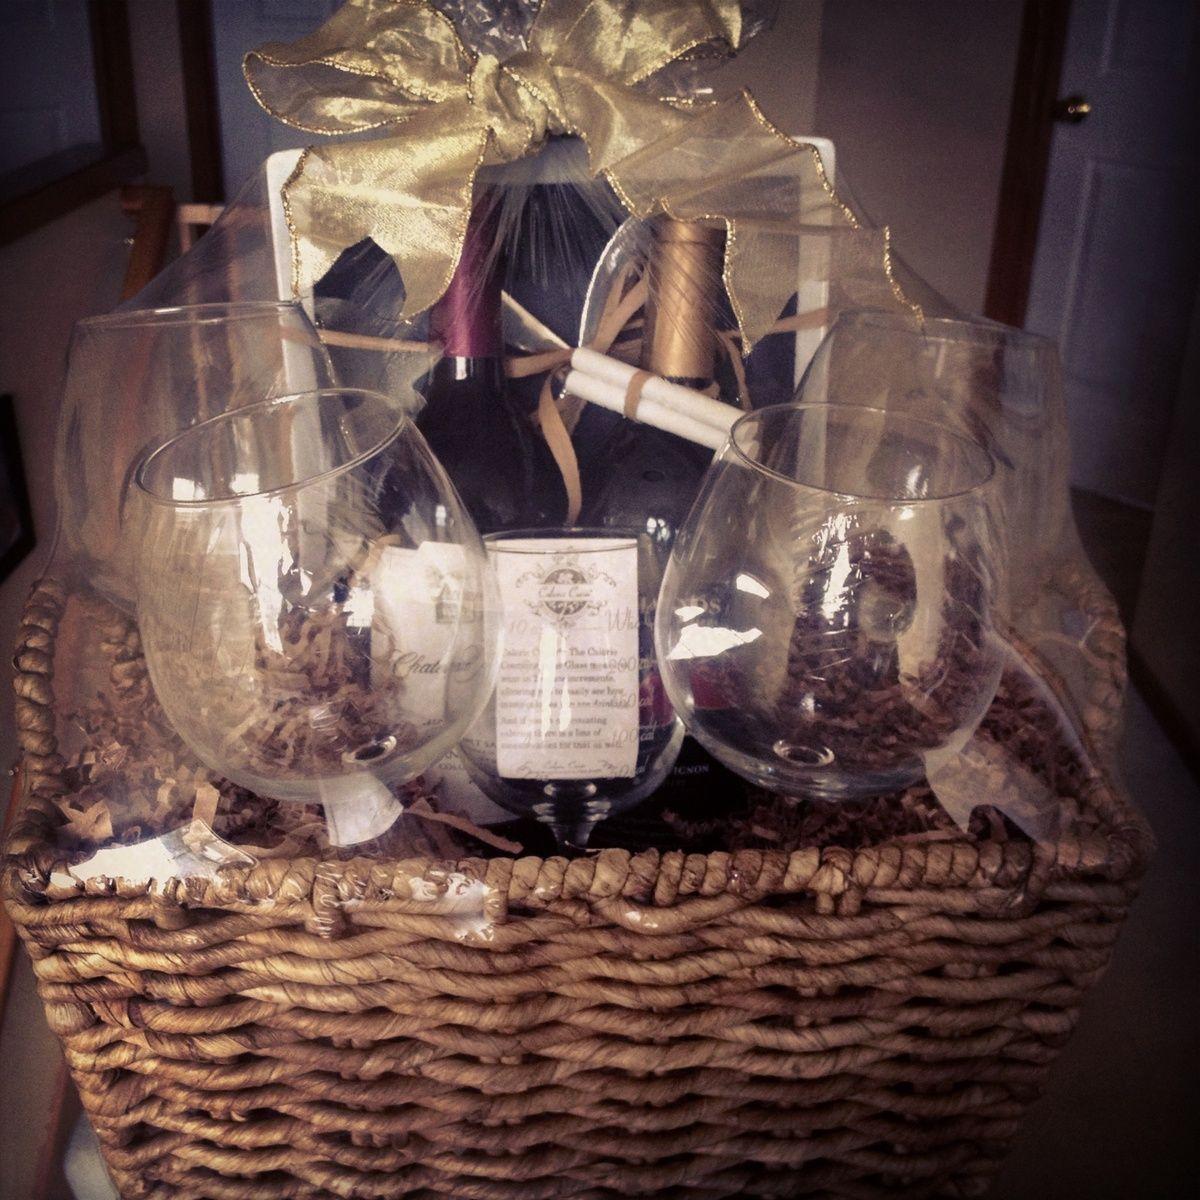 Wedding Gift Wine Basket: Pin By Sonja Templeton On Winey Bicth